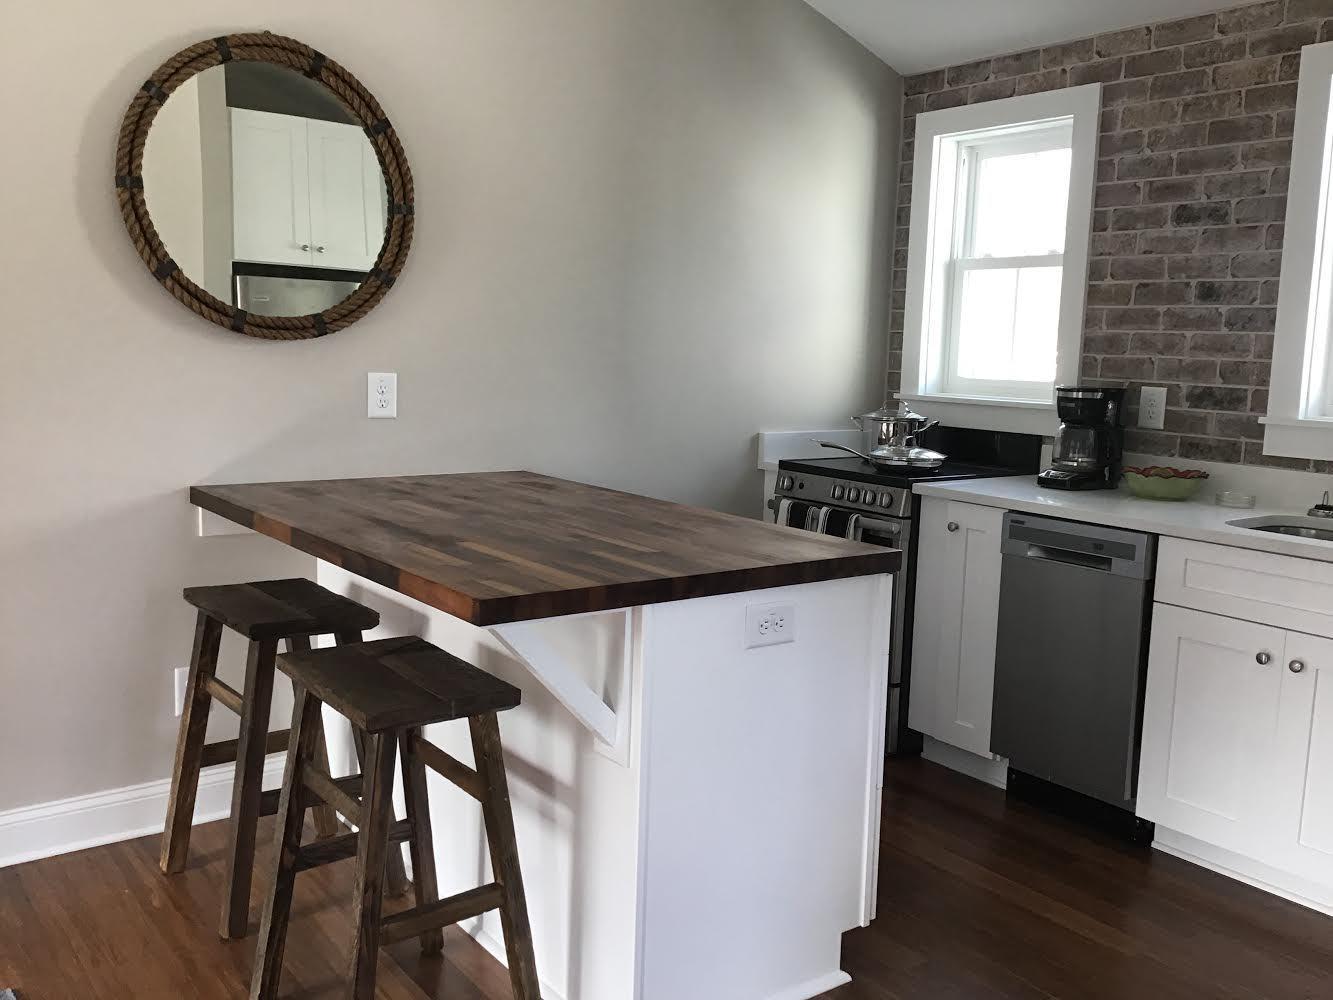 Old Mt Pleasant Homes For Sale - 542 Center, Mount Pleasant, SC - 6